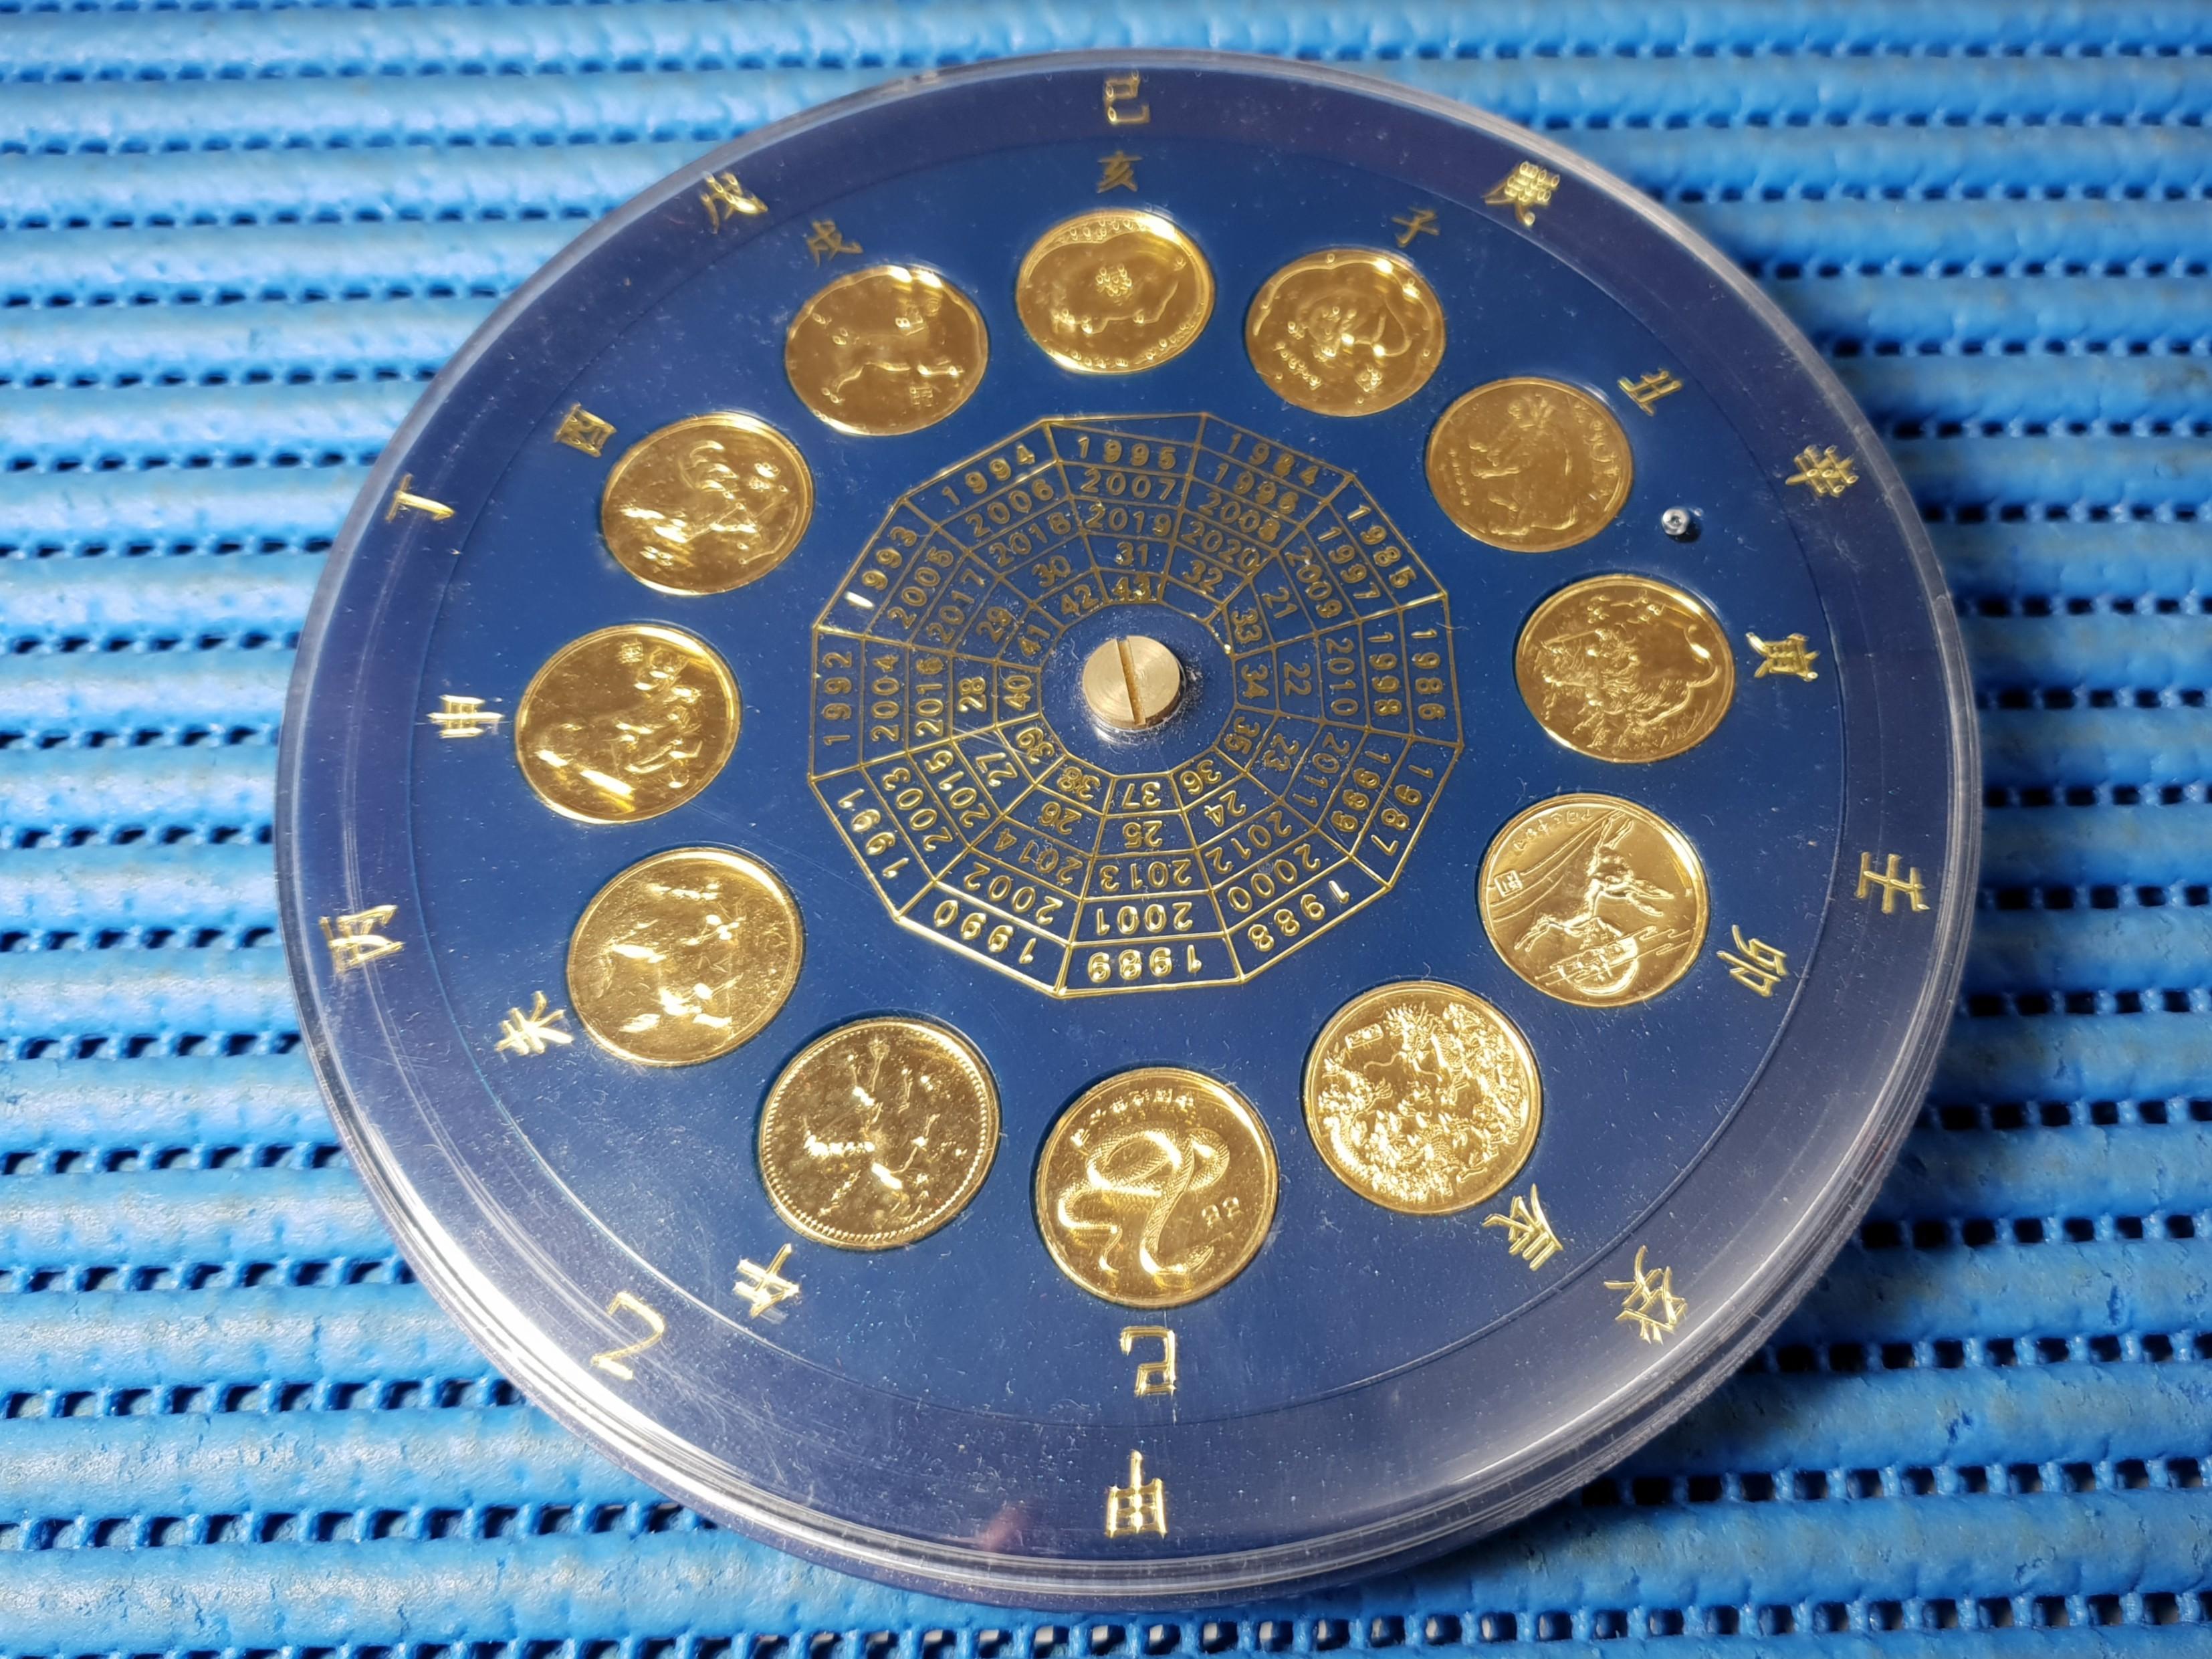 Chinese Circular Lunar Zodiac Calendar from 1984 - 2020, Vintage